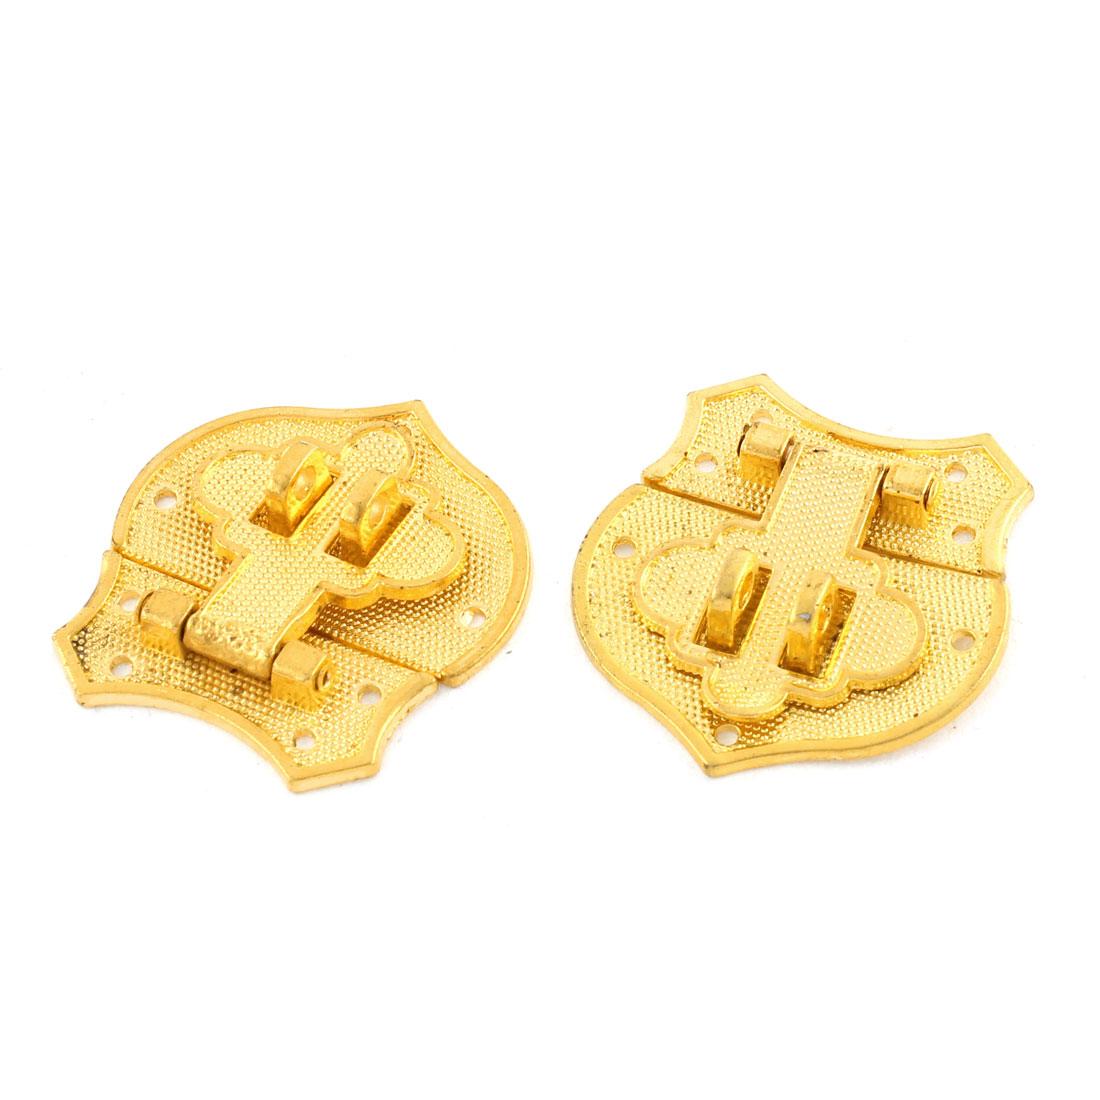 2pcs 41mmx40mm Gold Tone Zinc Alloy Heart Shape Suitcase Box Lid Hidden Hole Latch